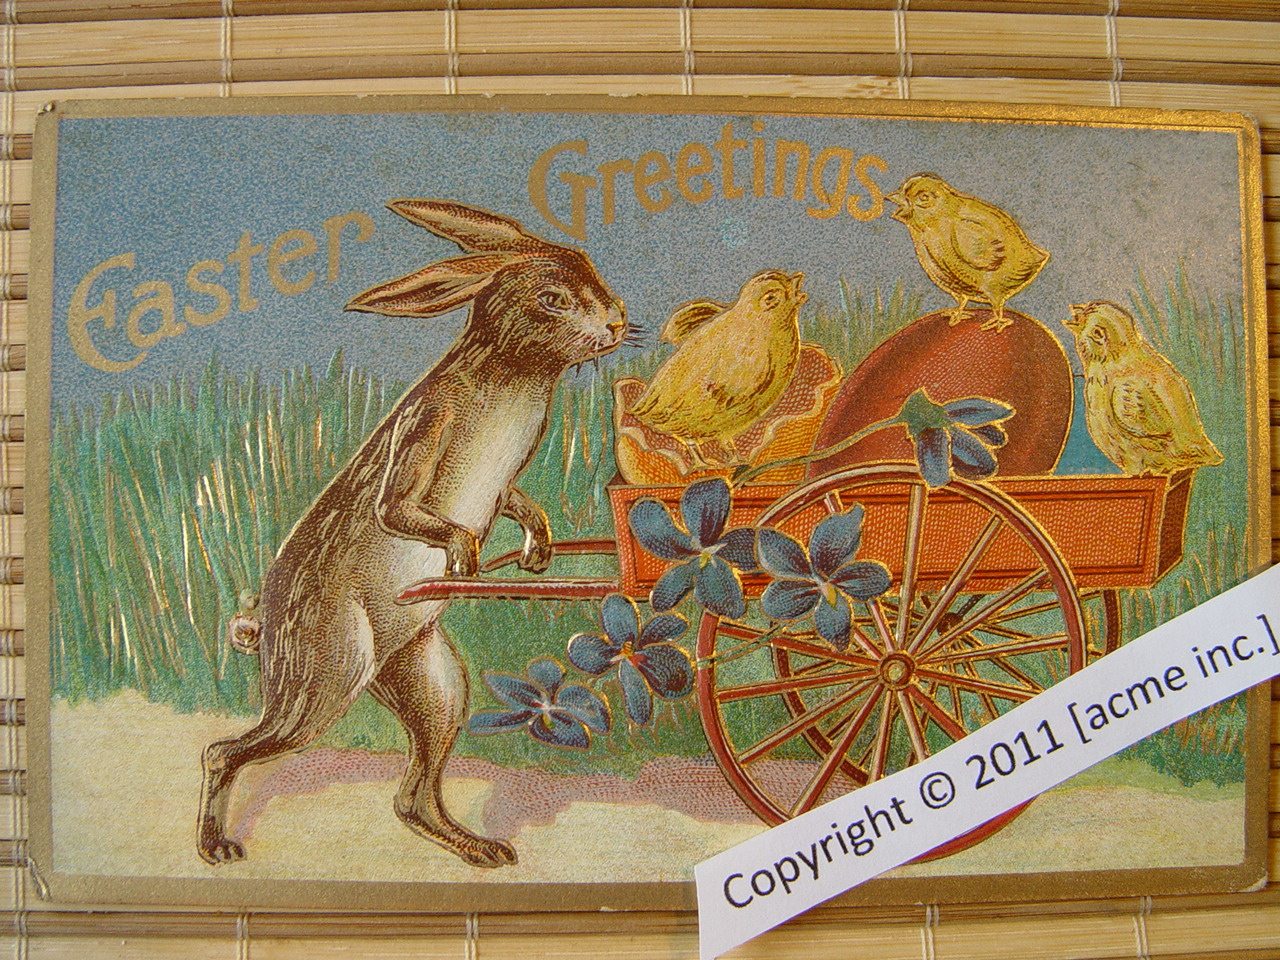 http://www.acme-inc.co.uk/greetingscards/DSC05460.jpg